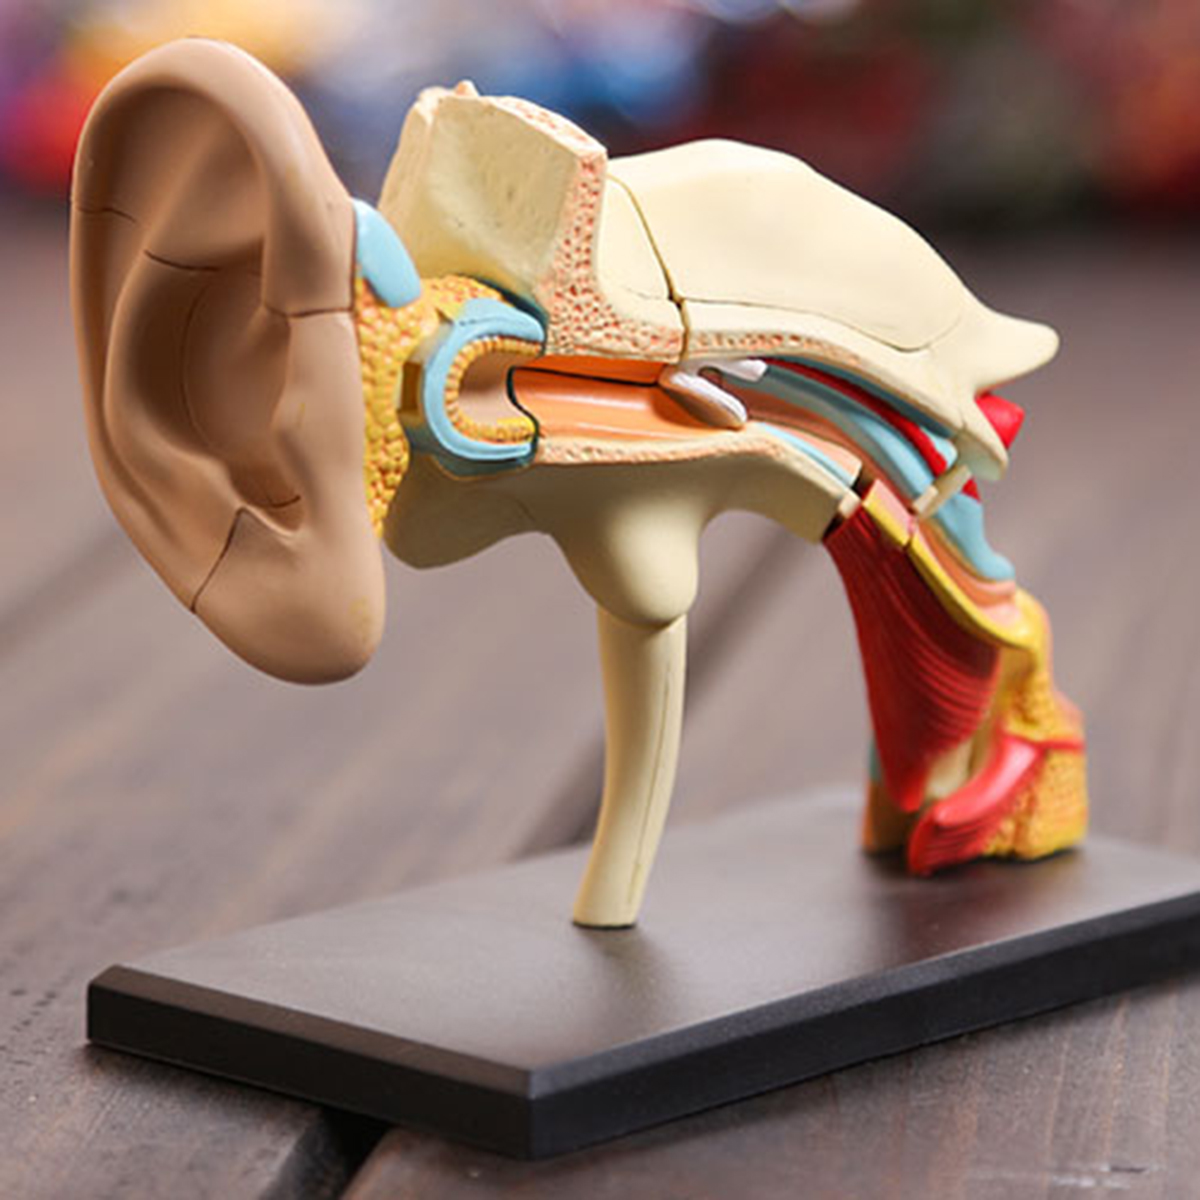 4d Vision Human Ear Anatomy Model Anatomical Medical Learn